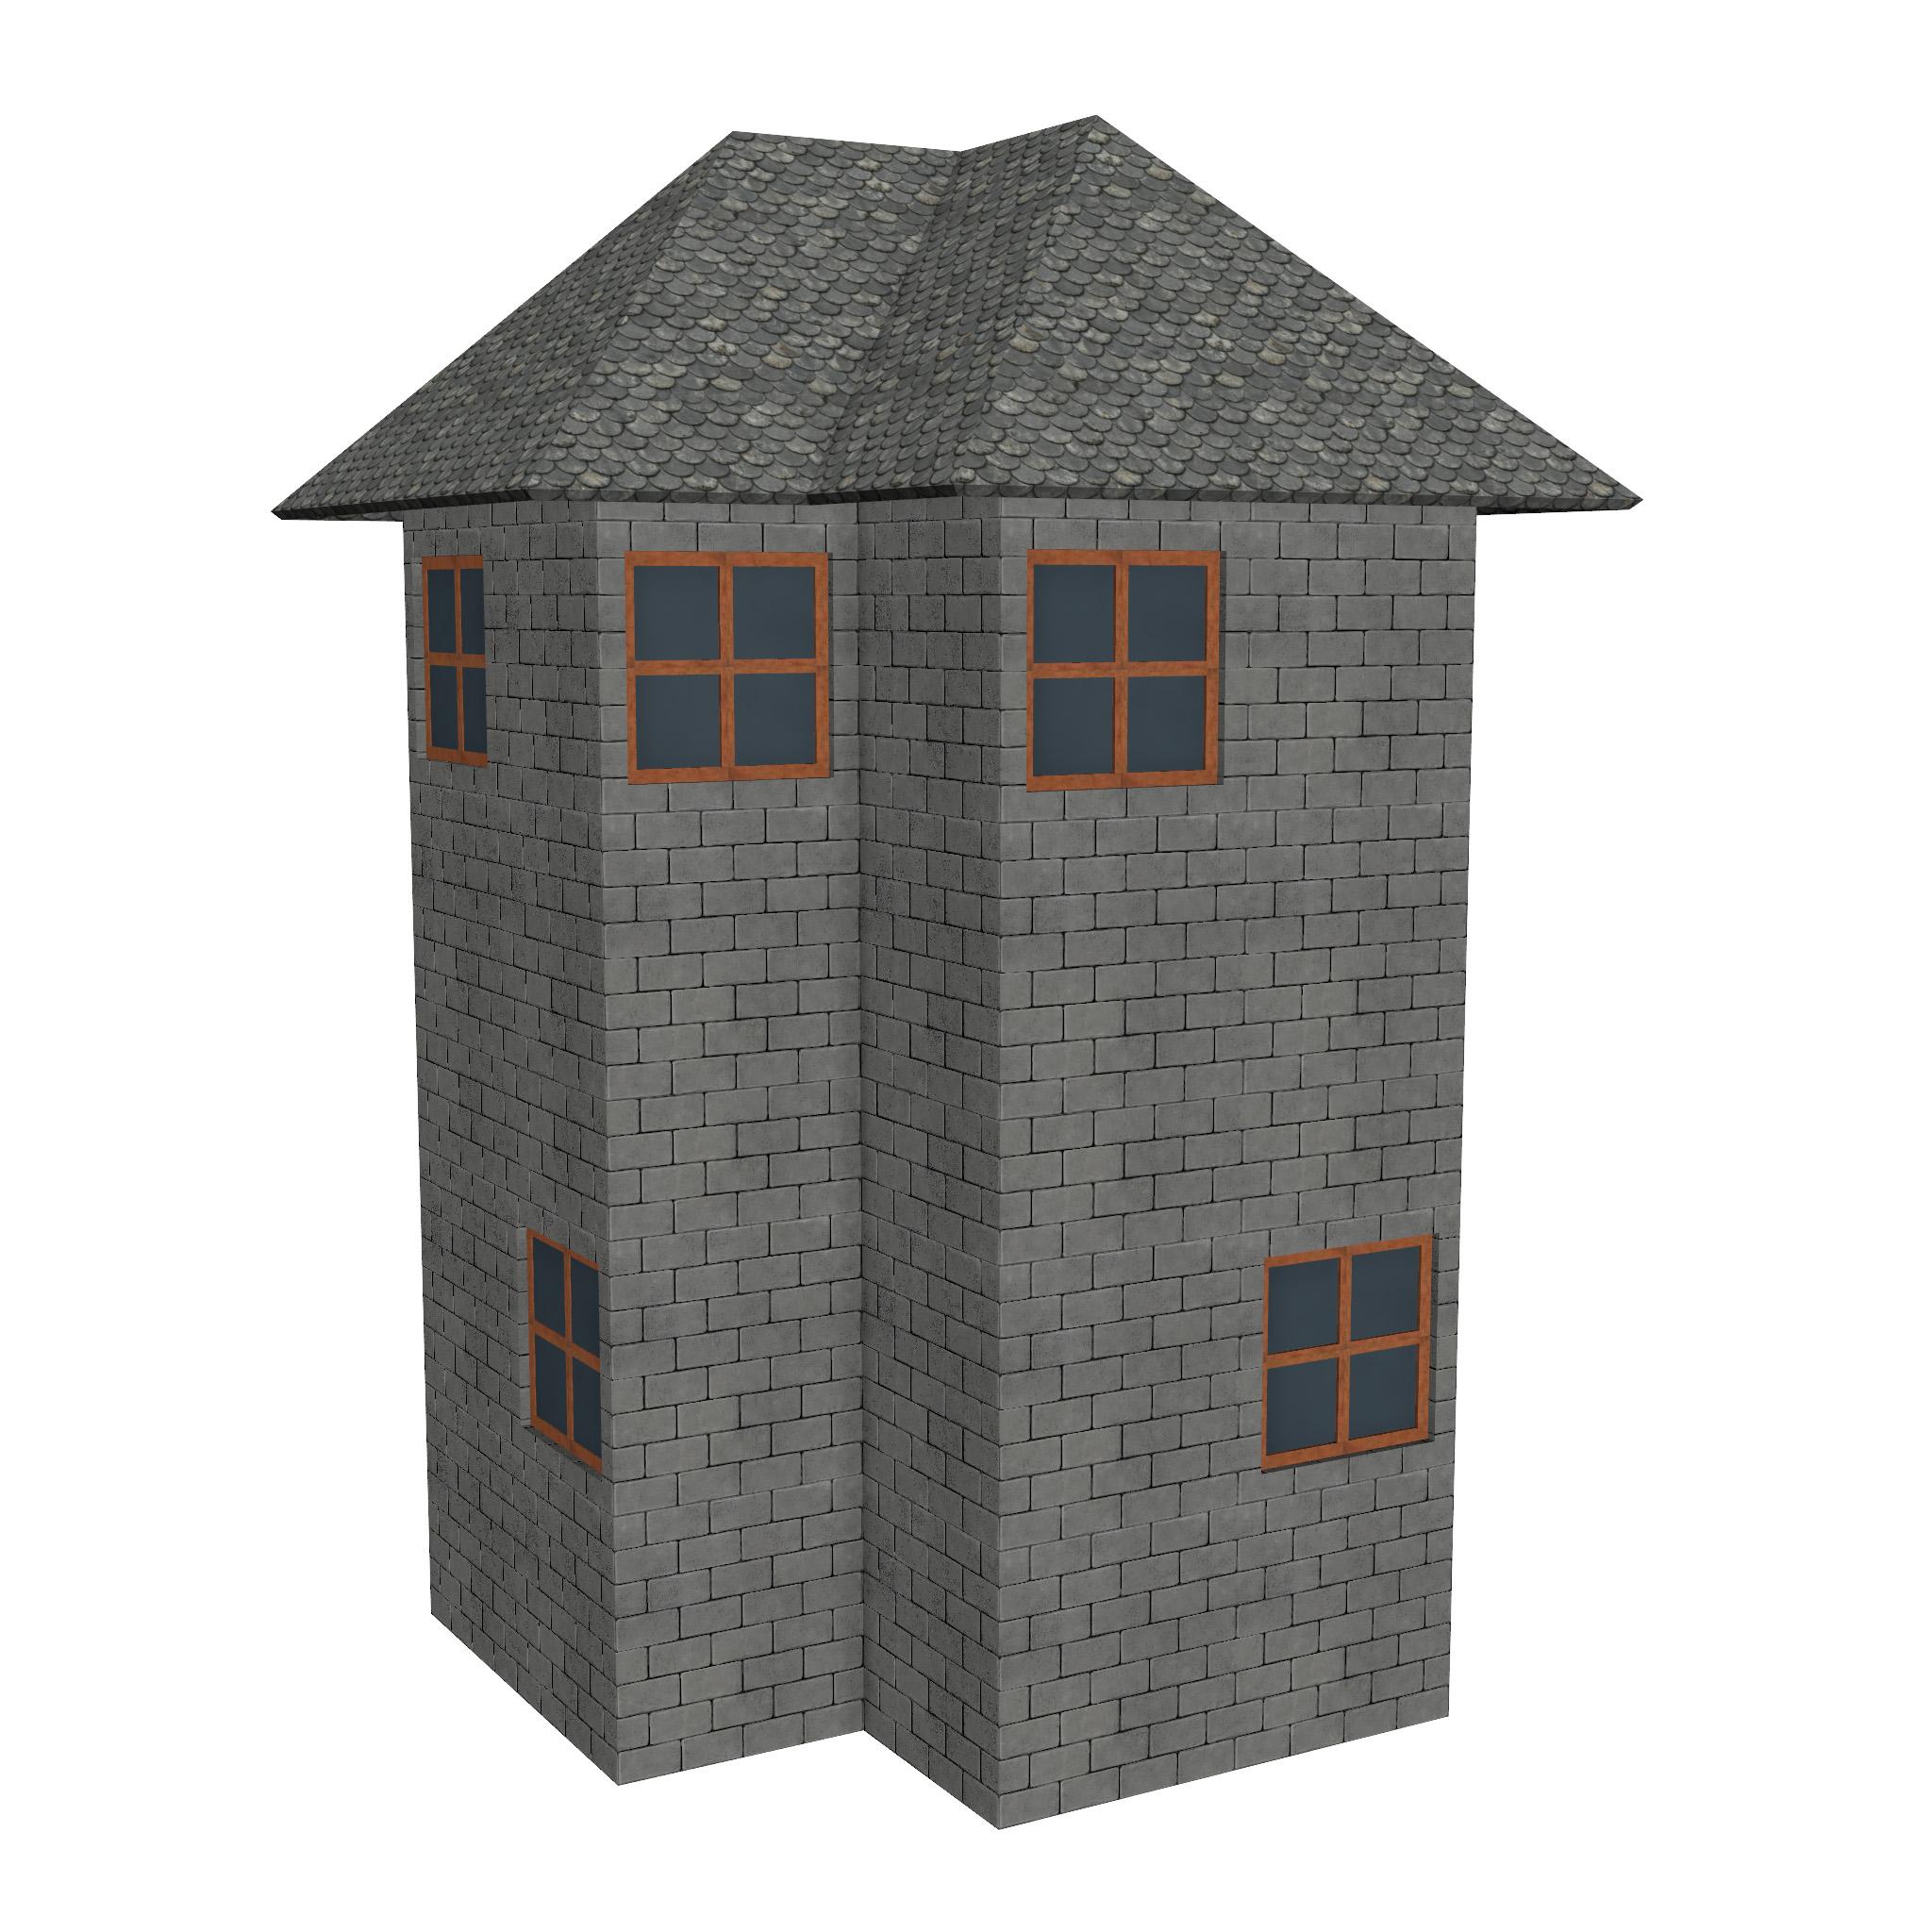 modular brick house set 3d model fbx ma mb 271396